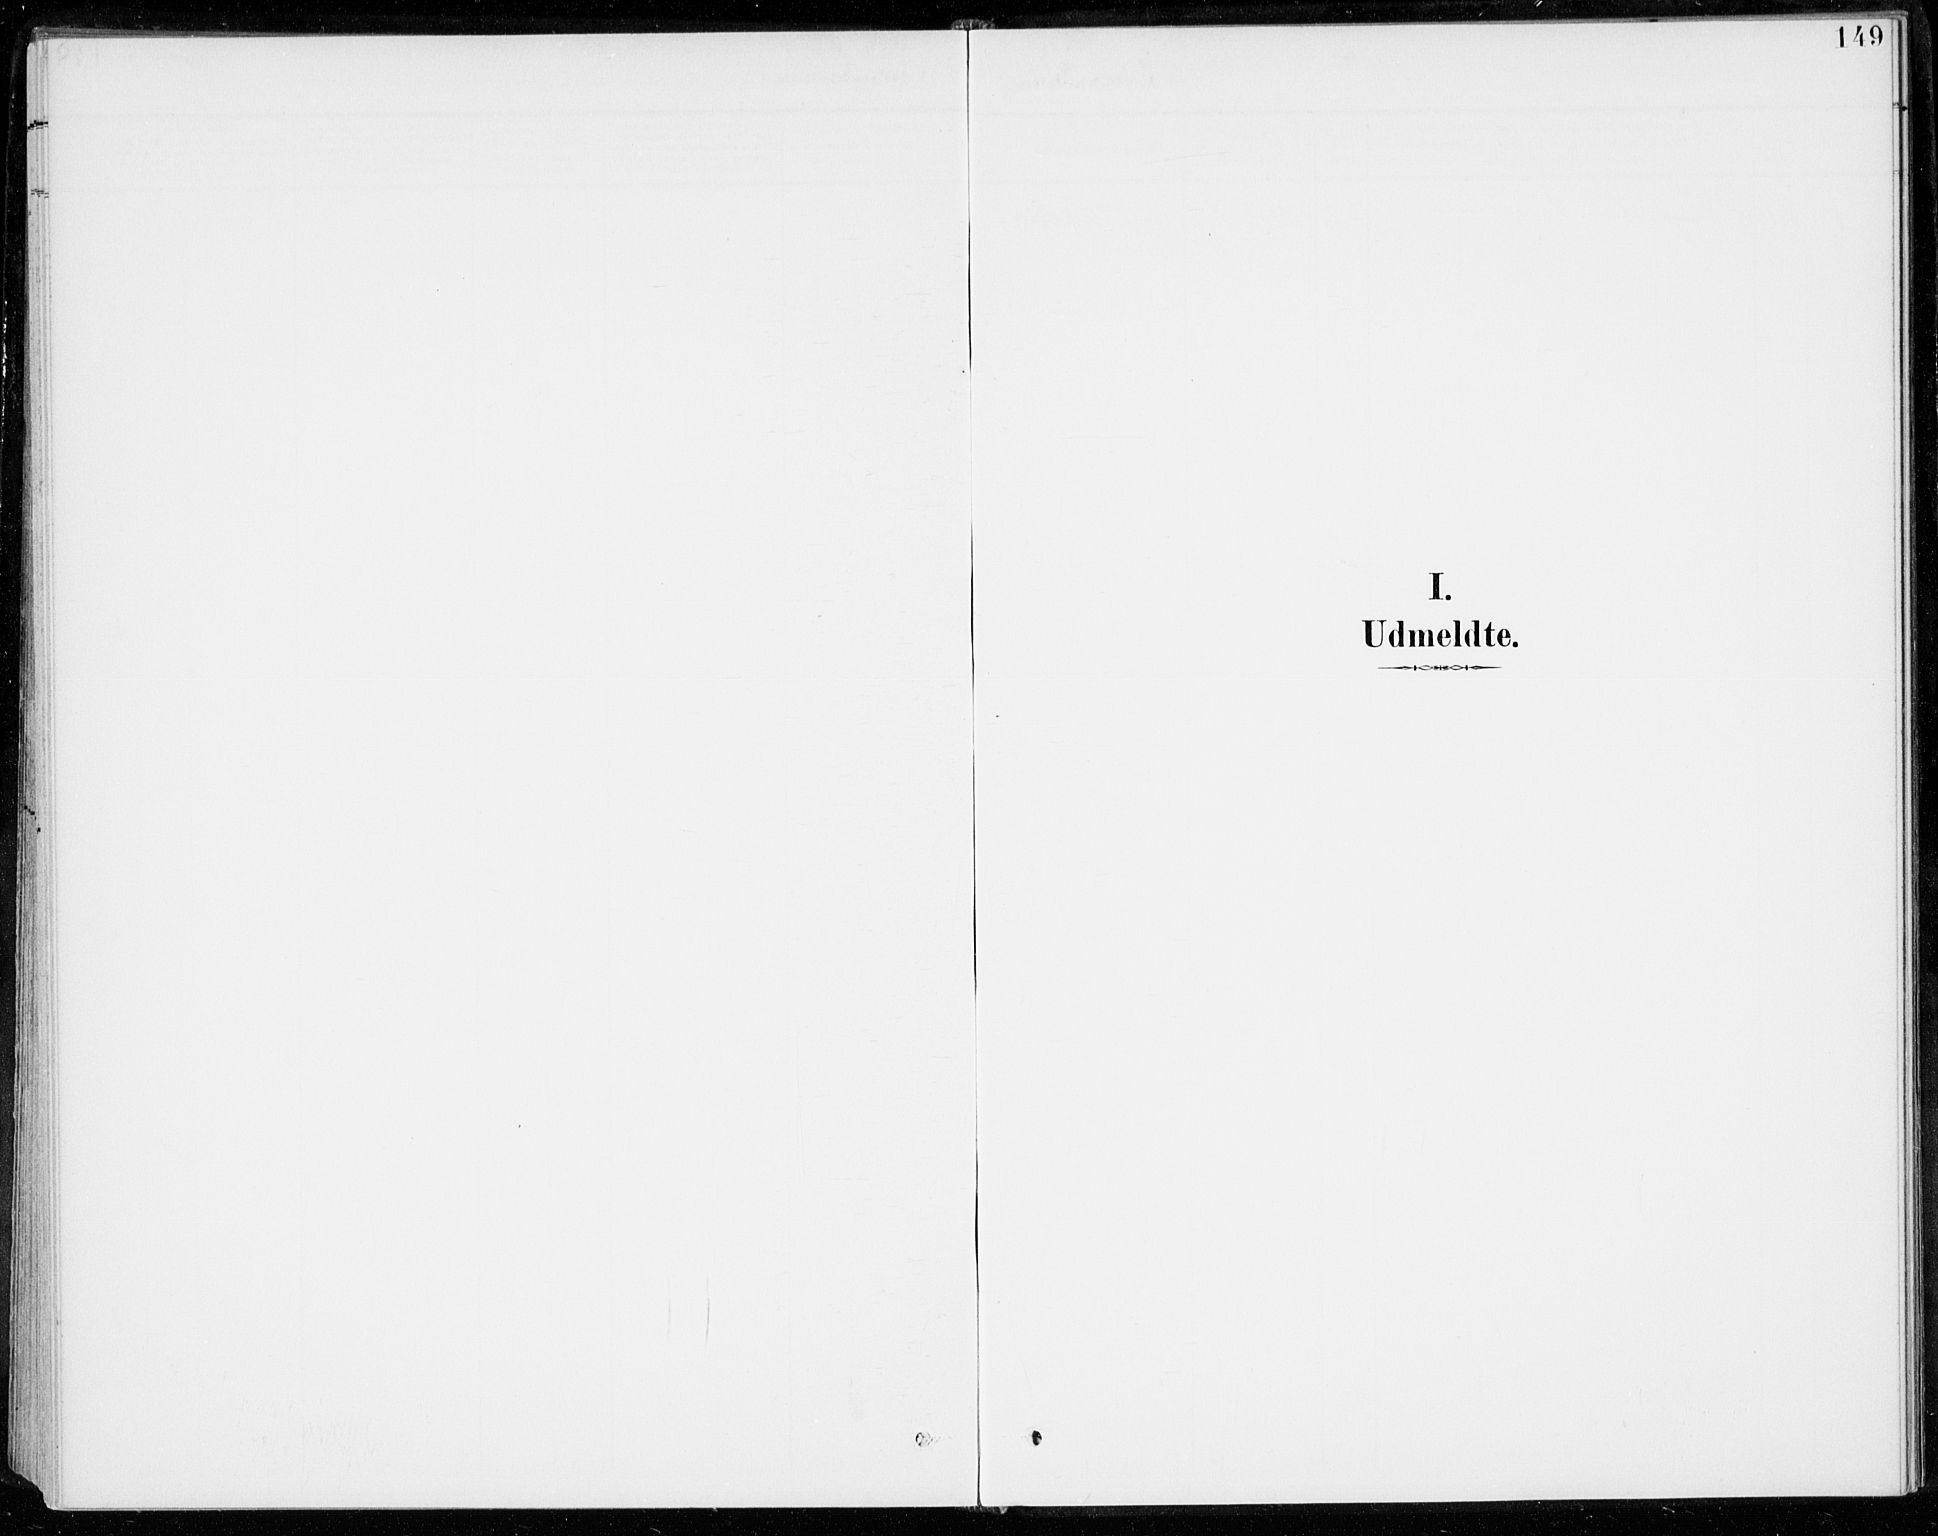 SAKO, Sigdal kirkebøker, F/Fc/L0002: Ministerialbok nr. III 2, 1894-1911, s. 149